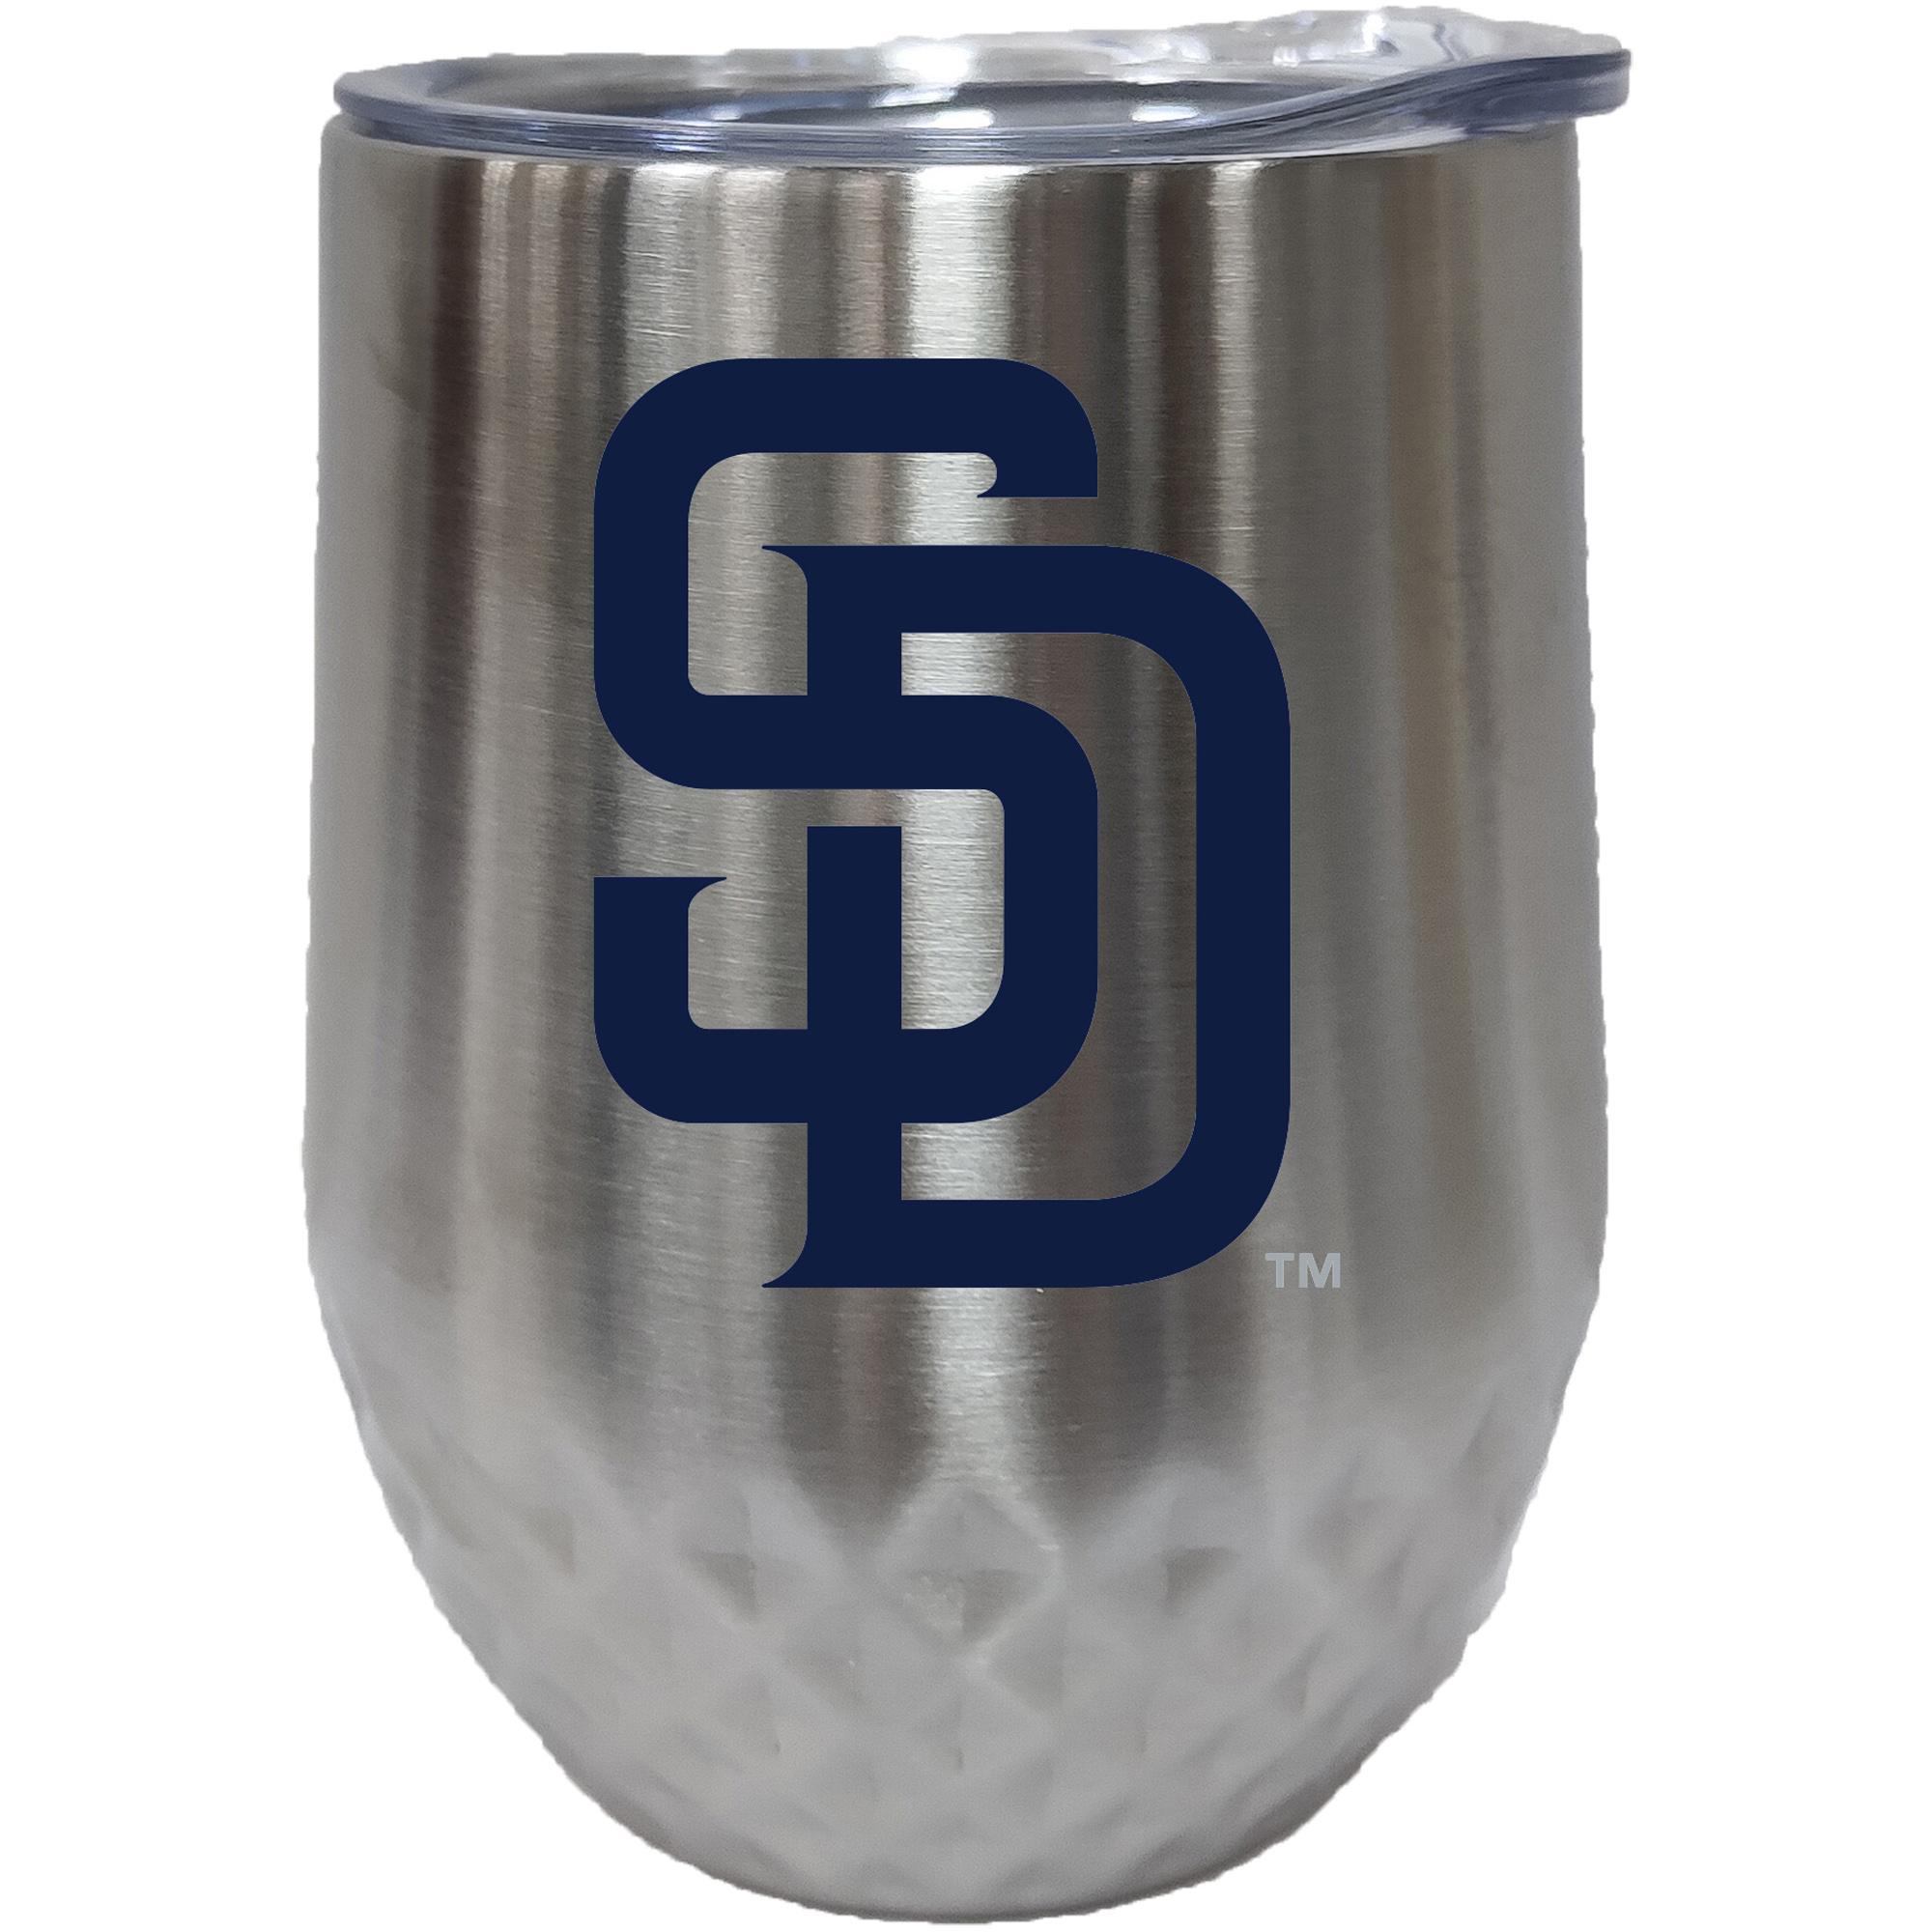 San Diego Padres 12oz. Stainless Steel Stemless Diamond Tumbler - No Size